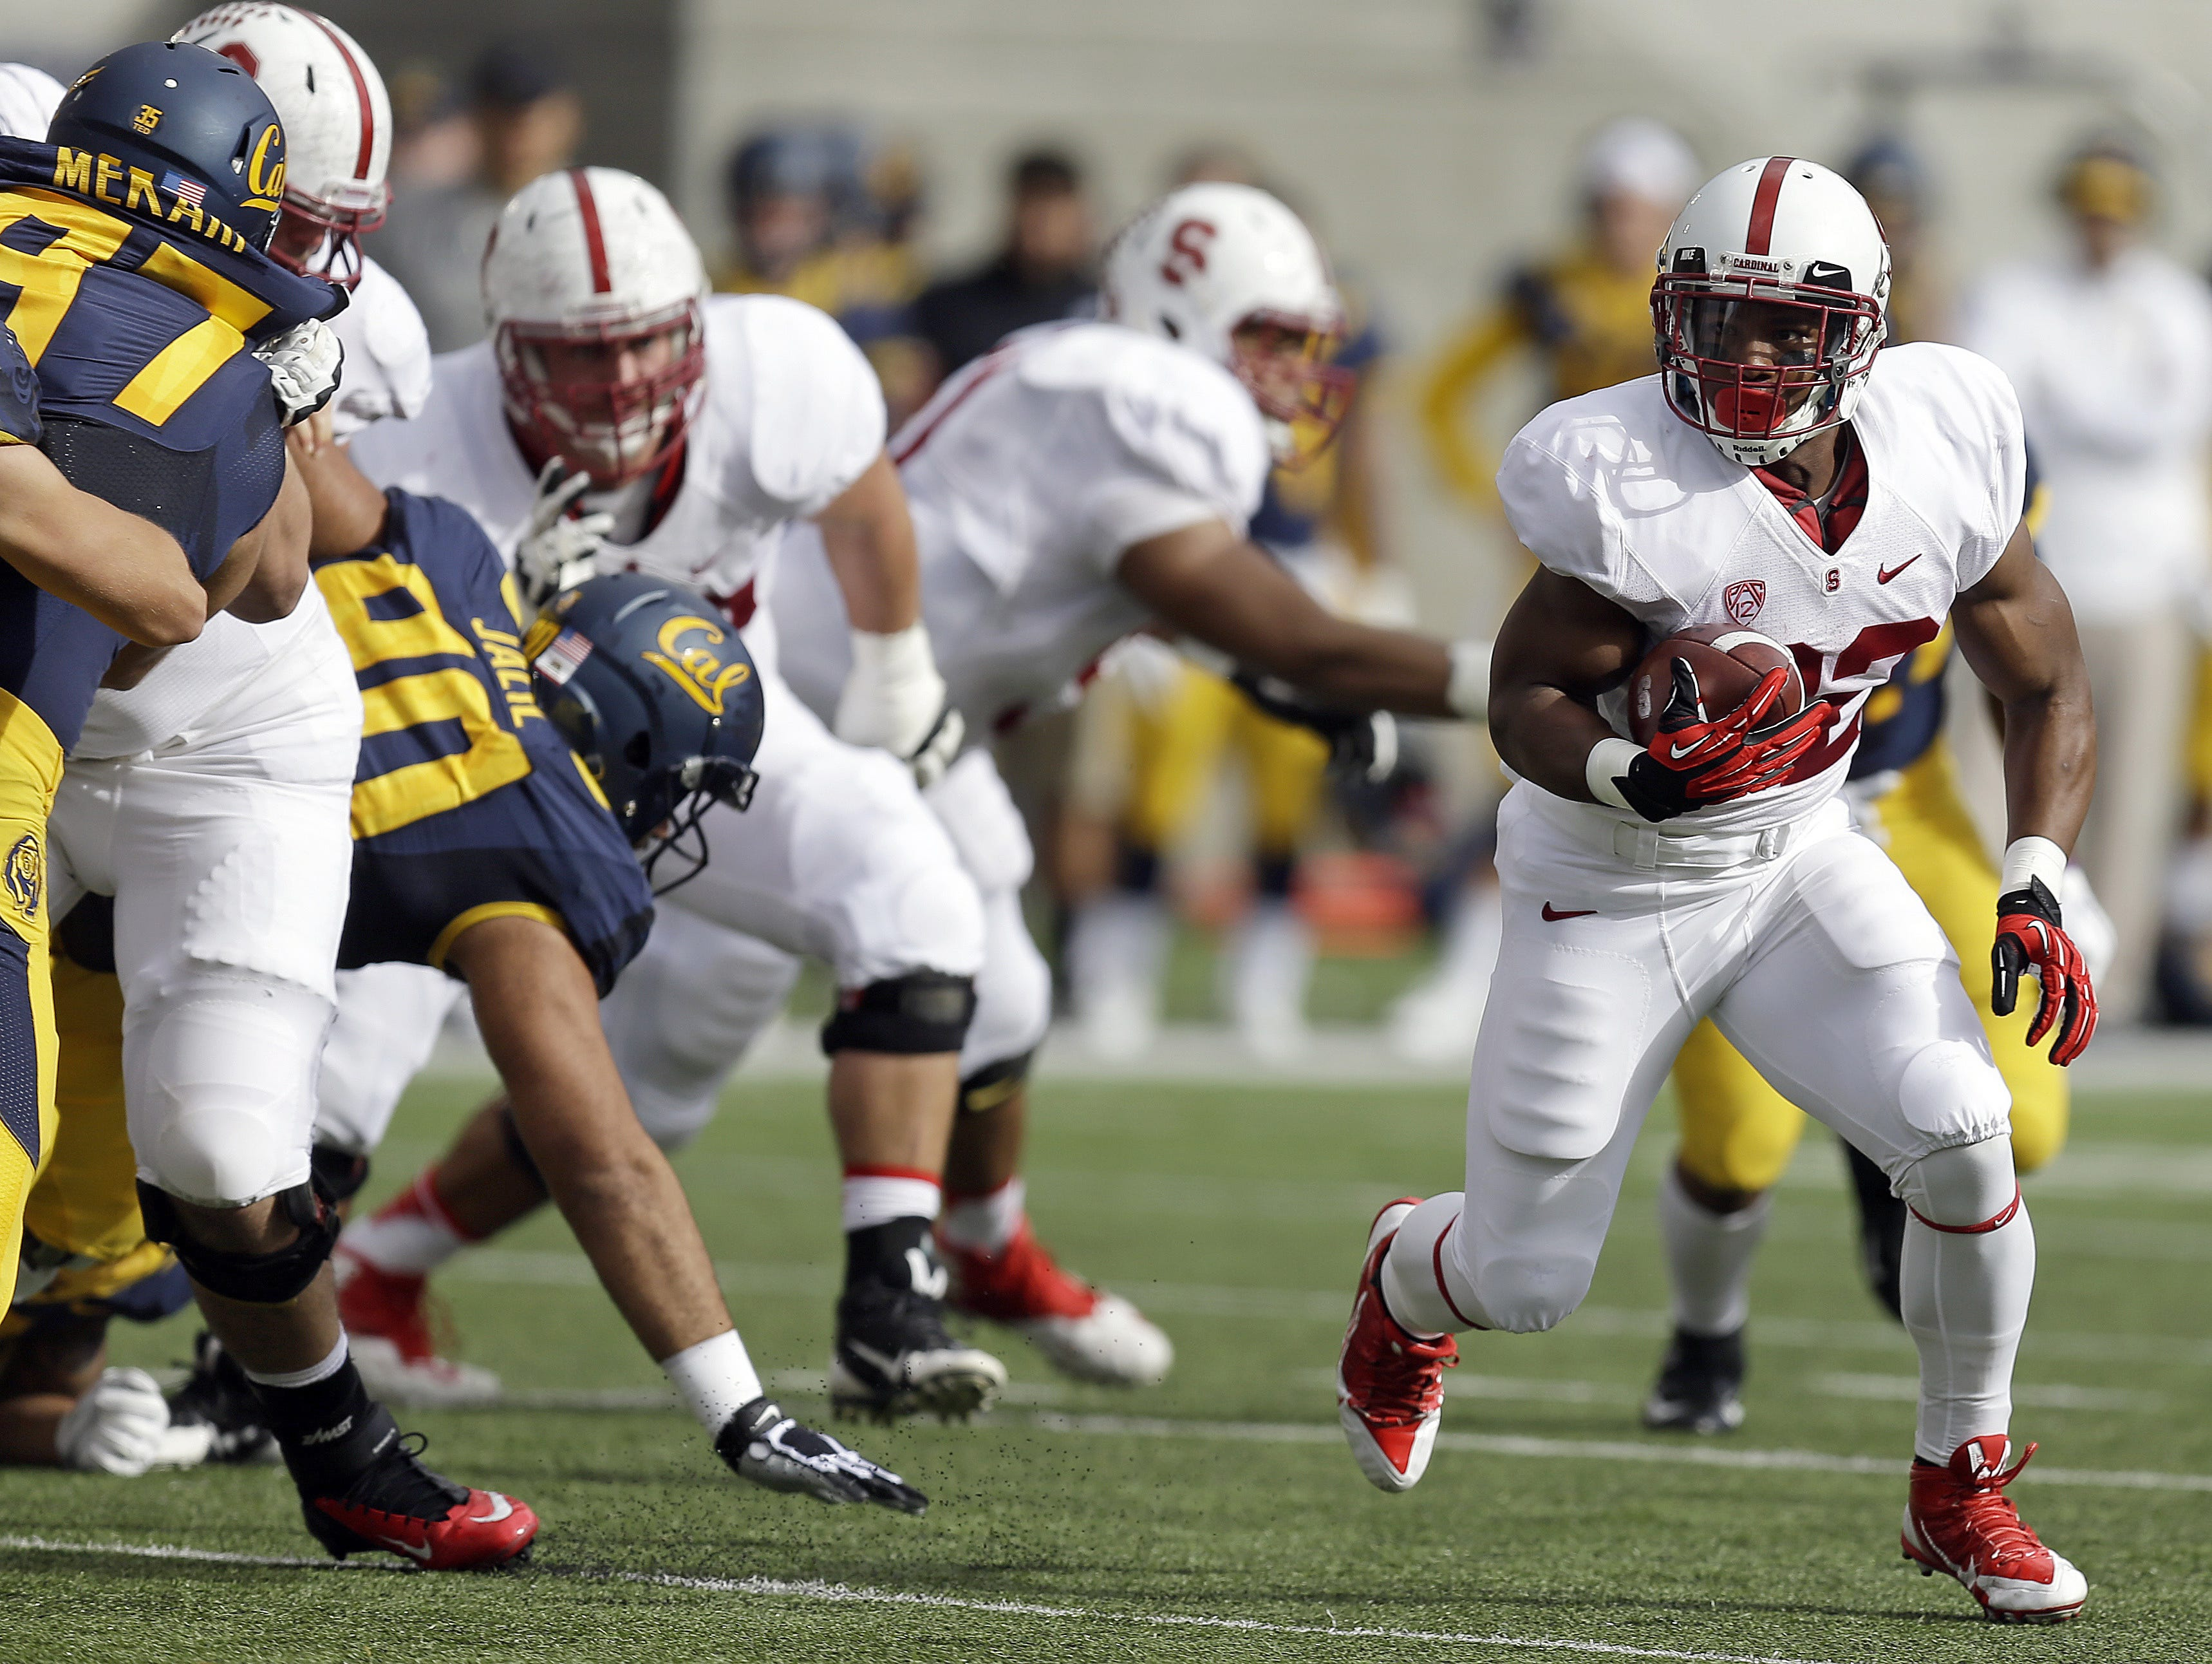 Stanford's Remound Wright